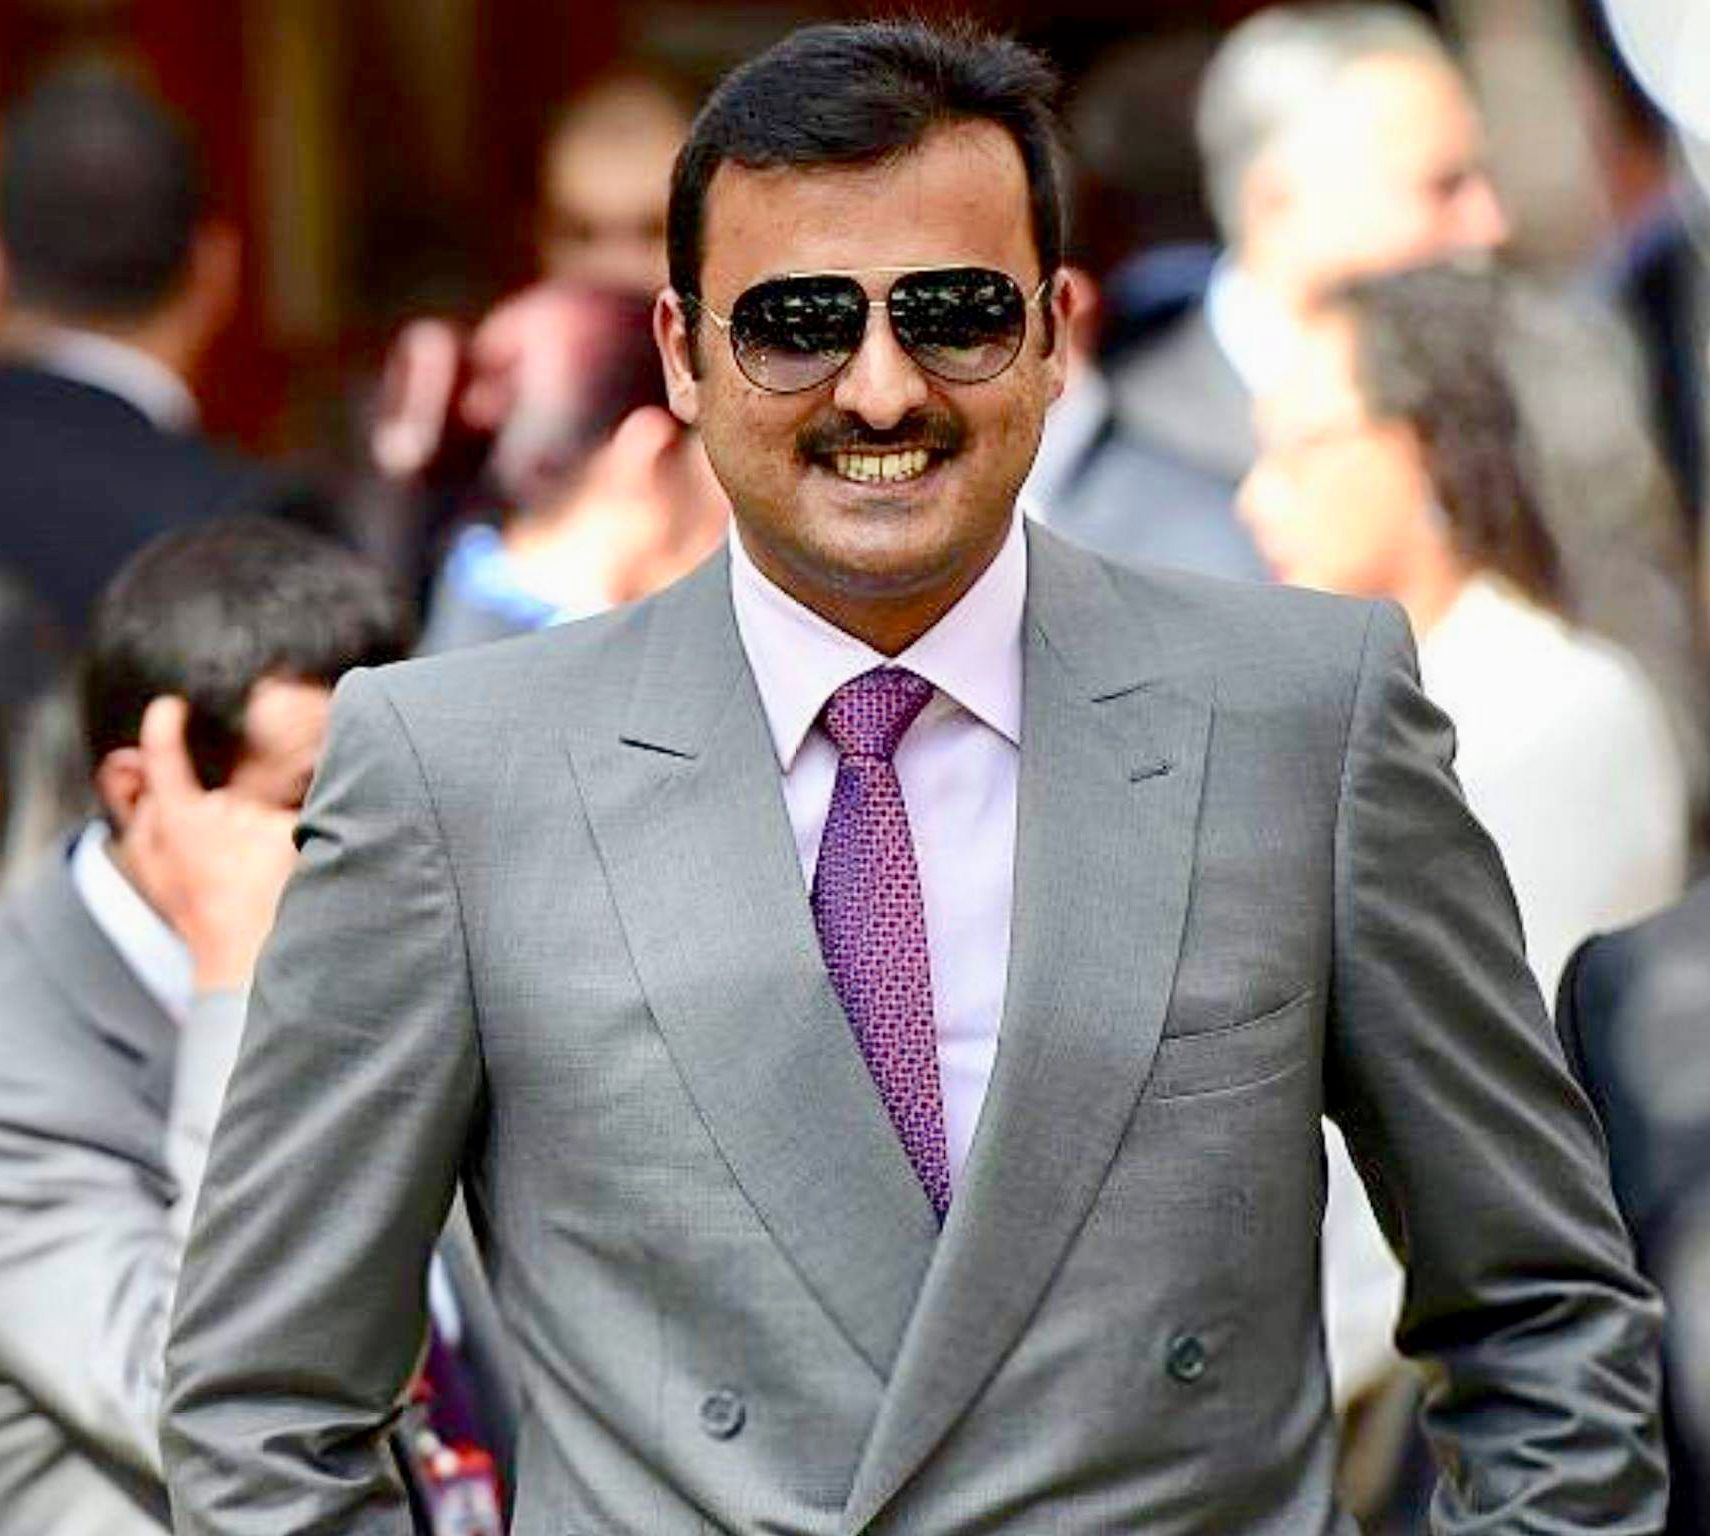 الشيخ تميم بن حمد آل ثاني أمير دولة قطر Hh Sheikh Tamim Bin Hamad Amir Of State Of Qatar Fashion Suit Jacket Single Breasted Suit Jacket